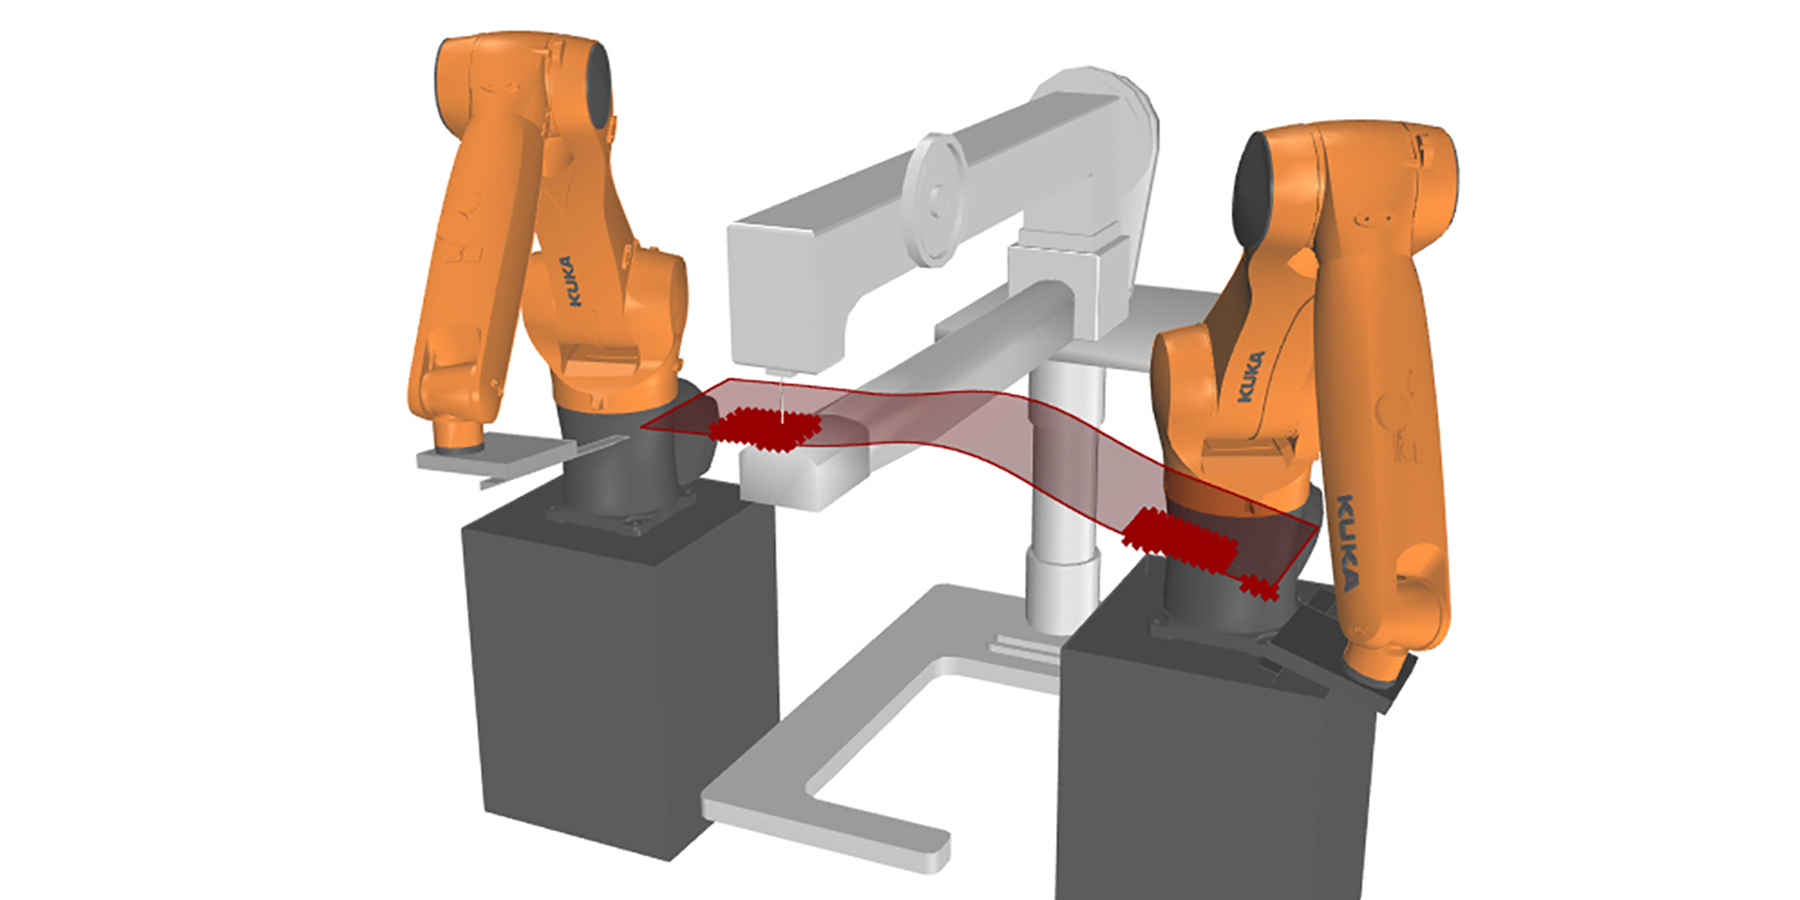 Kuka Robotic Fabrication